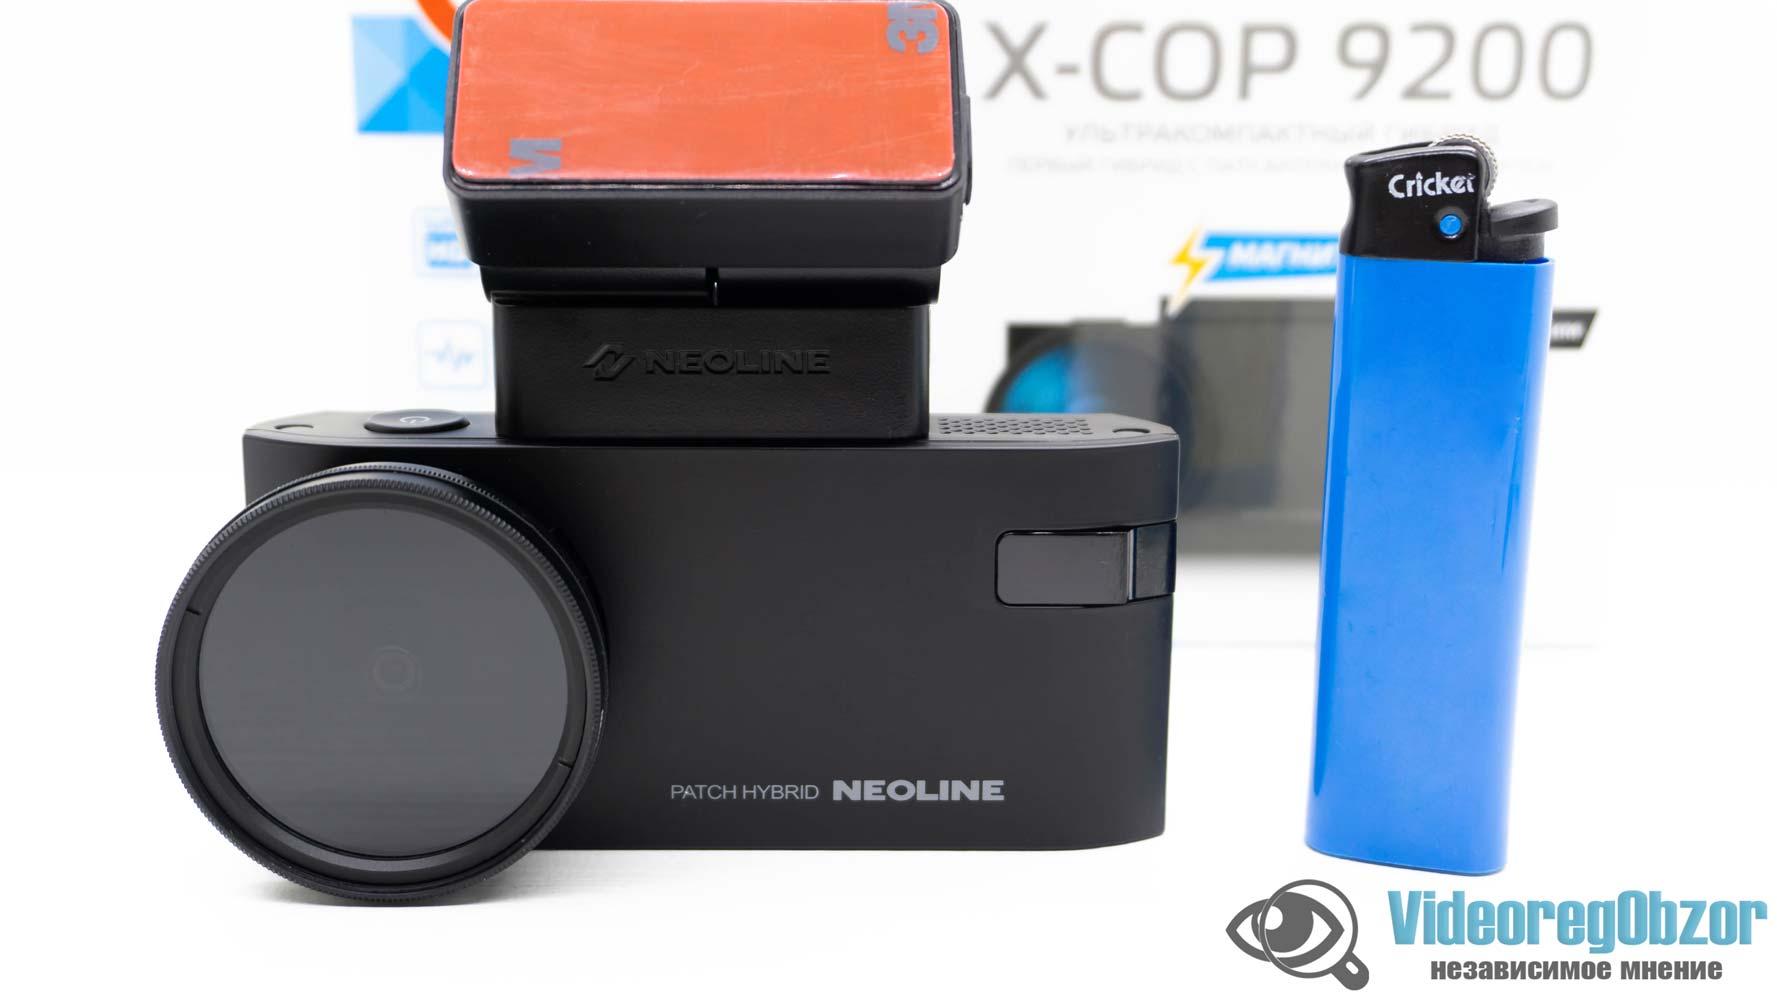 Neoline X COP 9200 обзор 24 VideoregObzor Neoline X-COP 9200: обзор видеорегистратора с радар-детектором